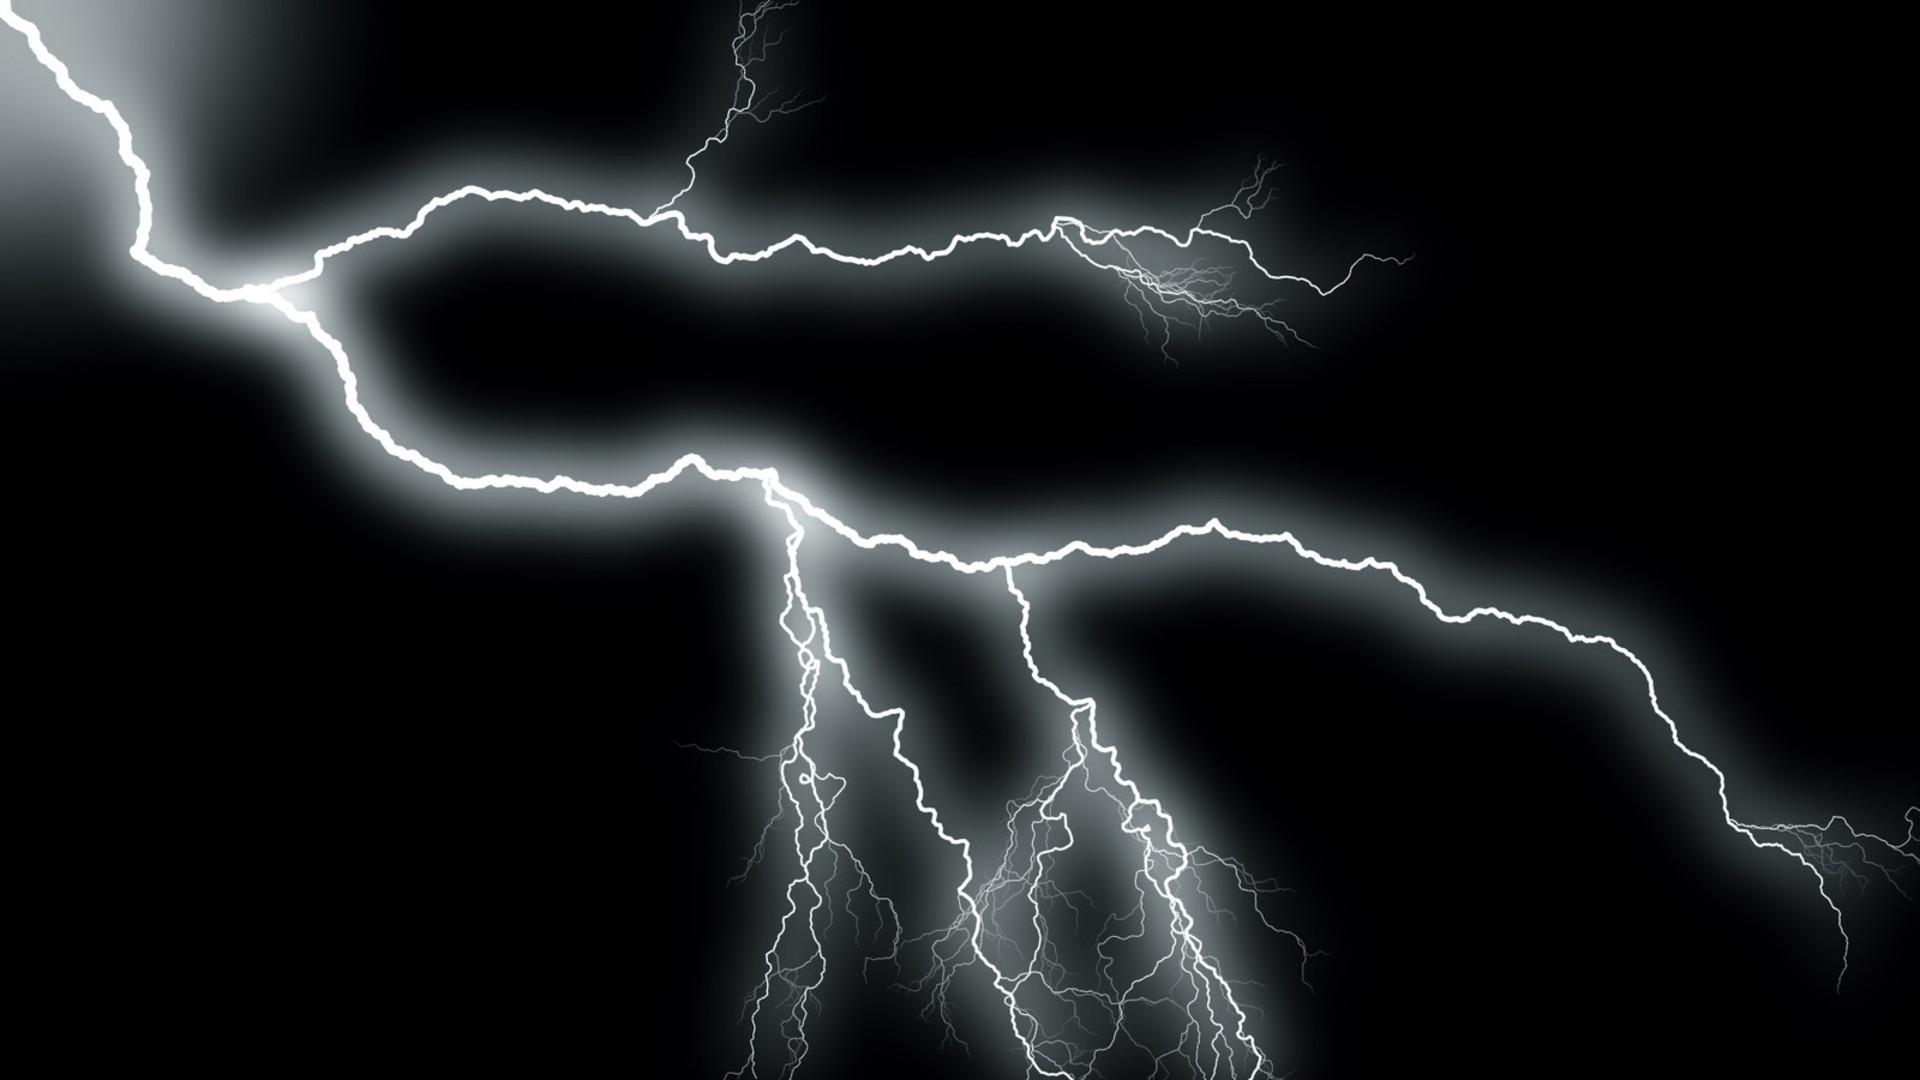 Res: 1920x1080, Lighting Bolt Wallpaper